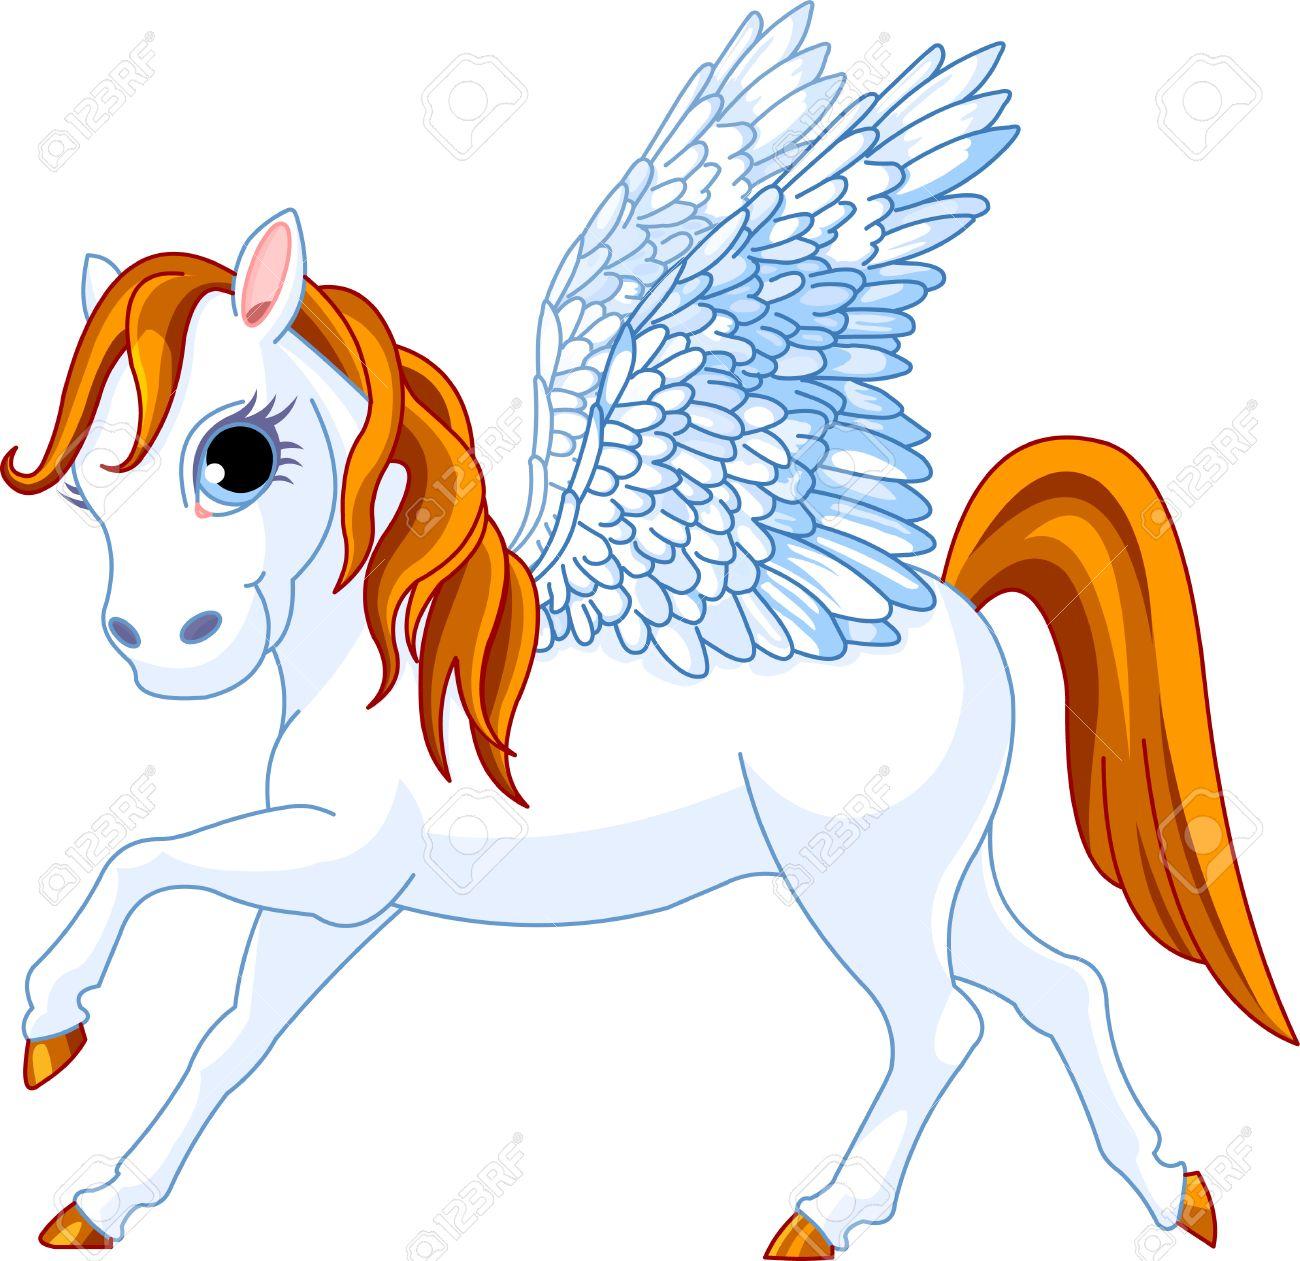 Cute winged horse of Greek mythology Stock Vector - 4702279